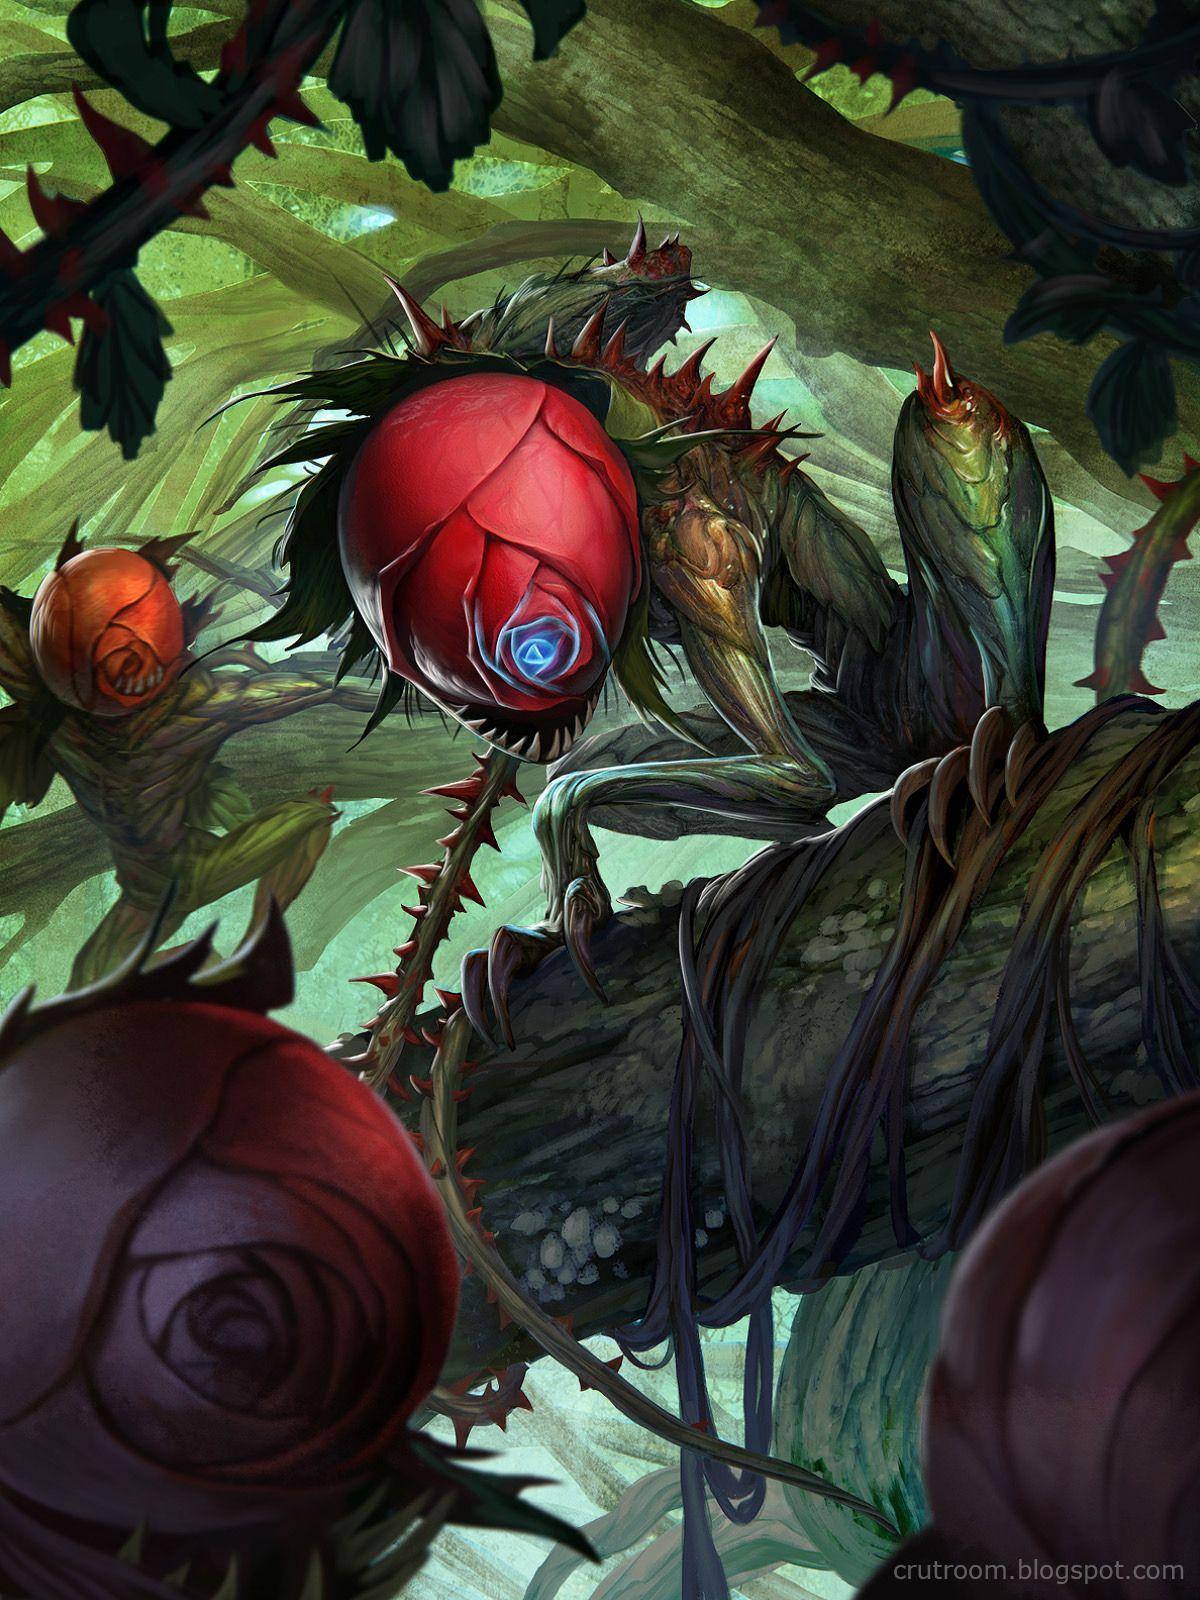 Artist: Rudy Siswanto aka crutz - Title: Rose Demon norm - Card: Murderous Rose Demon